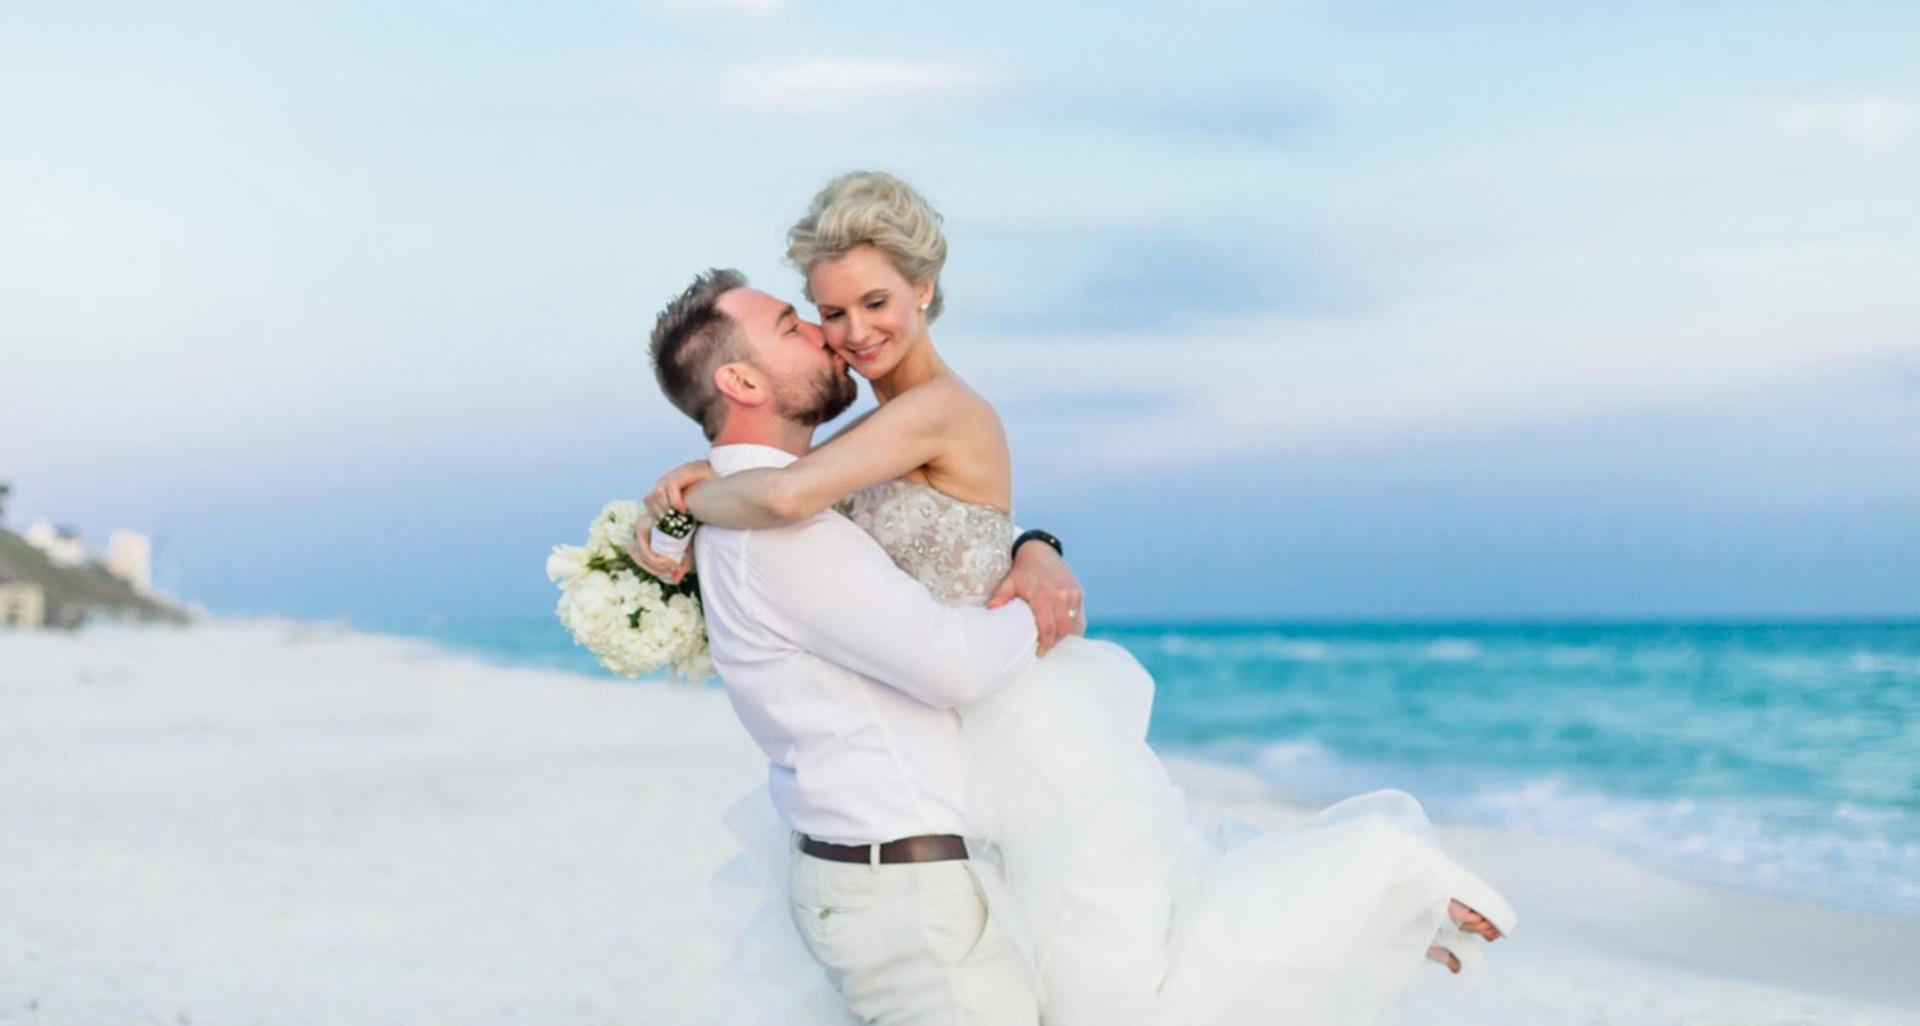 The Wallis' on the beach at their wedding